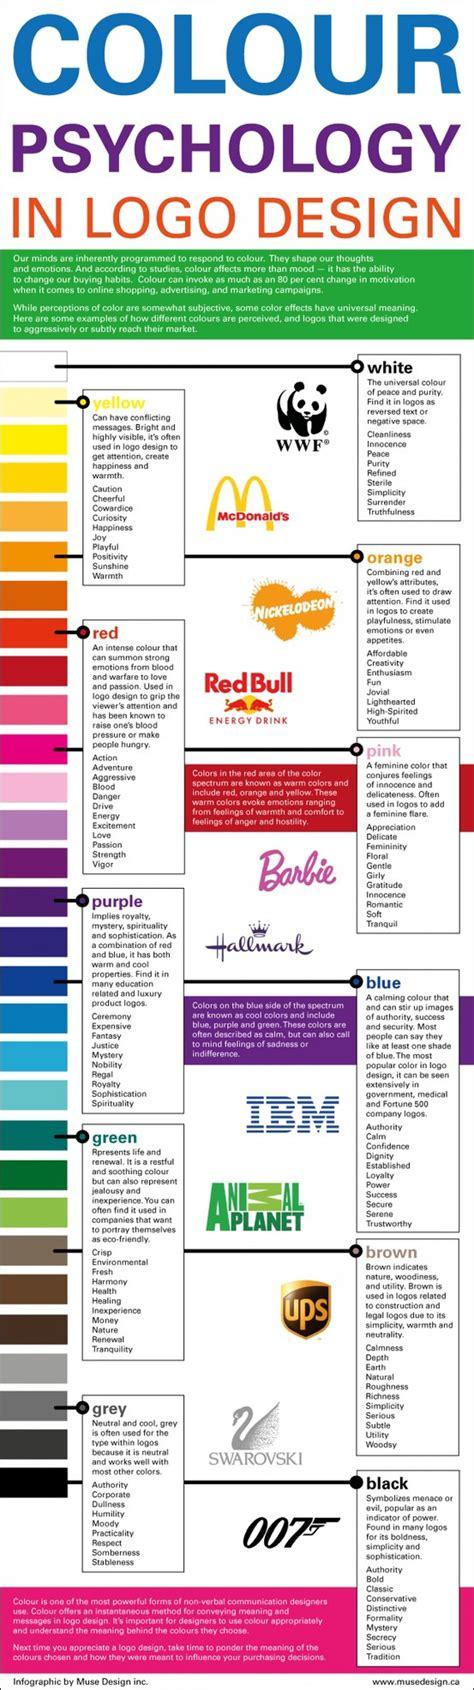 Color Psychology In Logo Design Visually